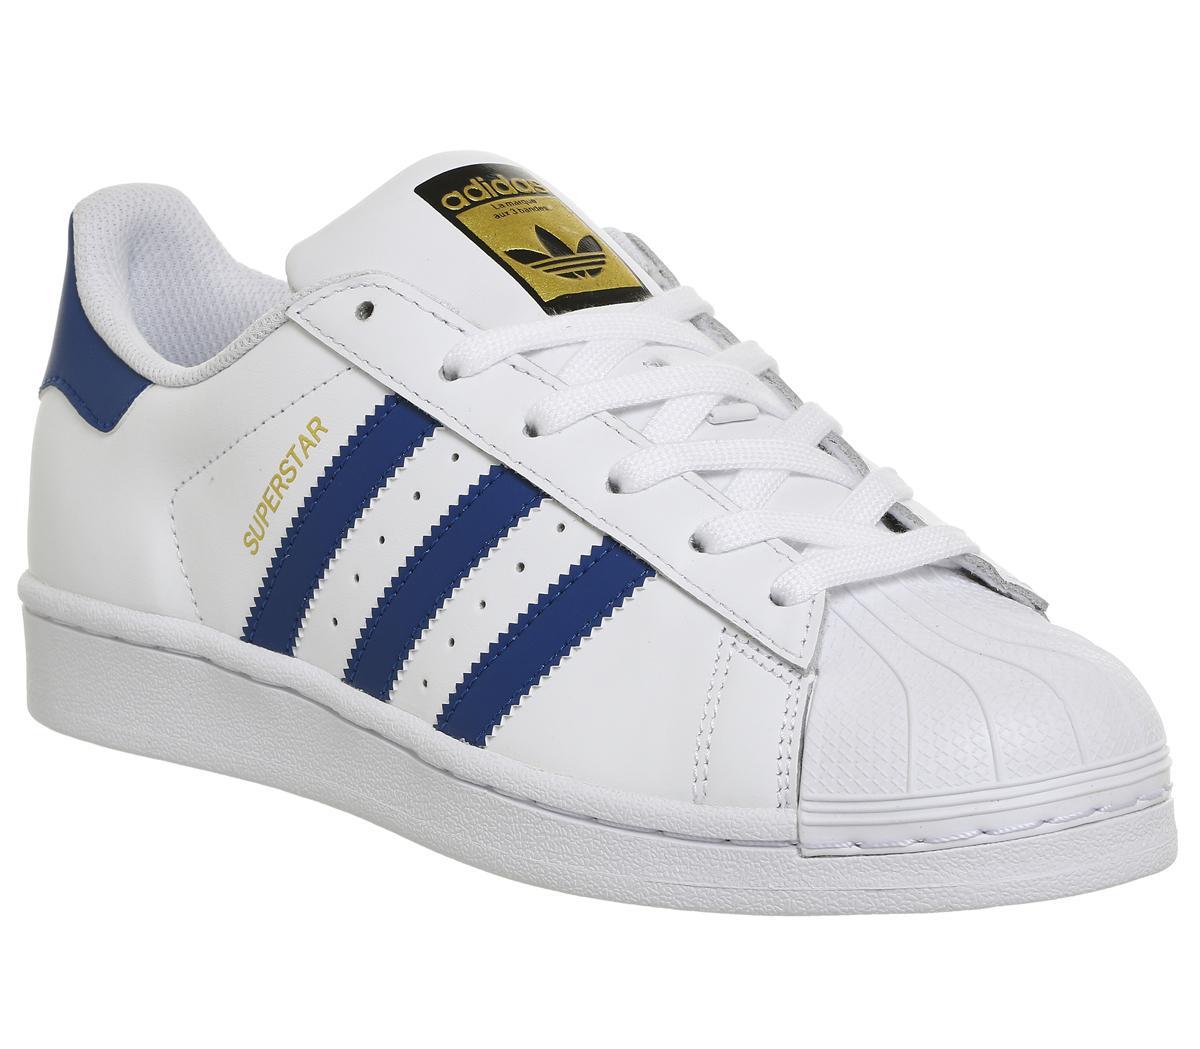 adidas superstar dark blue stripes